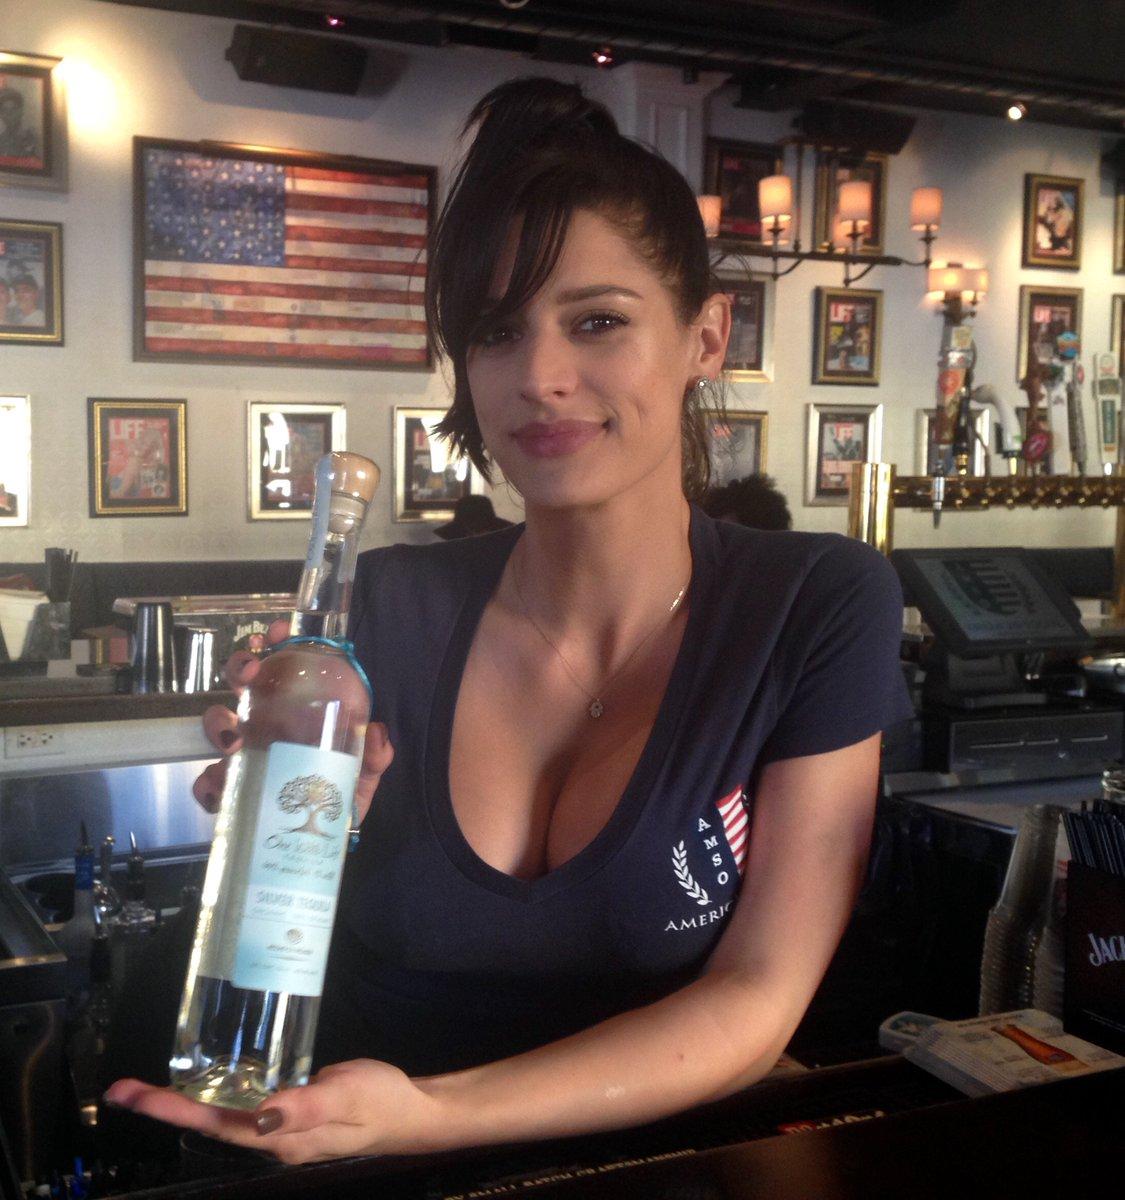 Jessica - American Social - Ft. Lauderdale